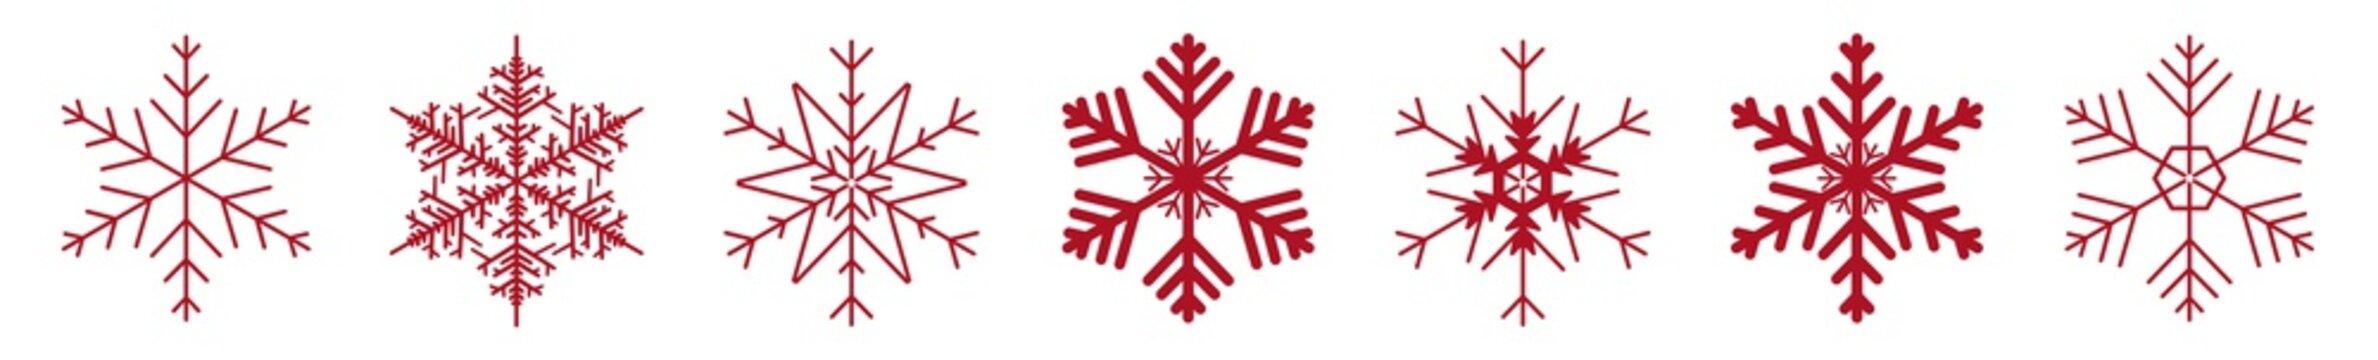 Snowflakes Red | Snowflake Icon | Christmas Logo | Ice Crystal Winter Symbol | Xmas Sign | Variations